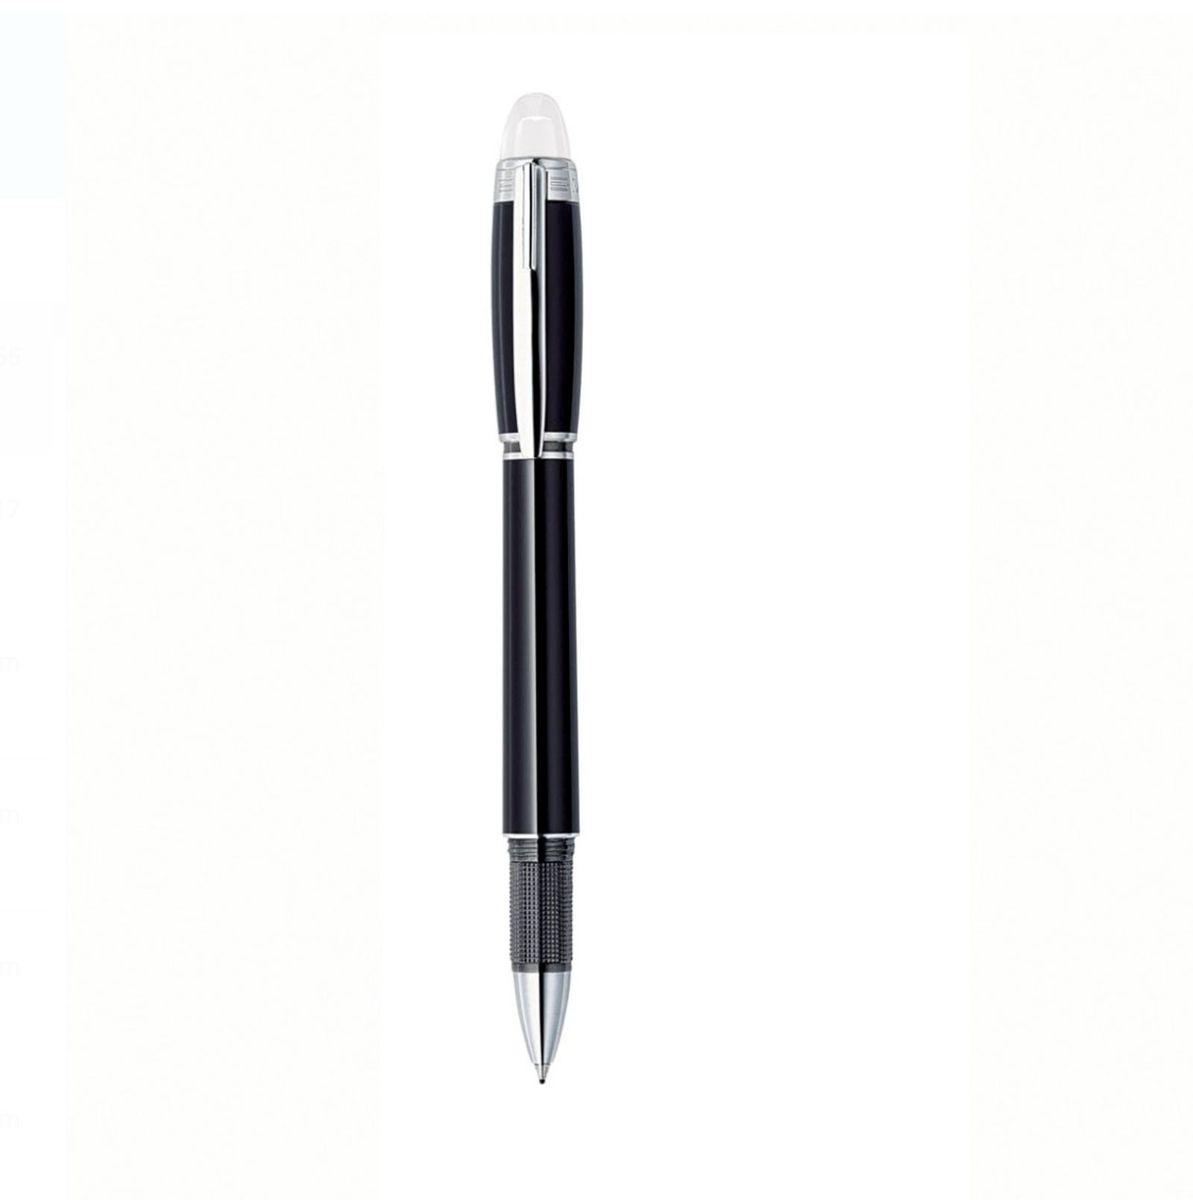 89ffb33f1e5 caneta montblanc fineliner starwalker platinum - jóias montblanc